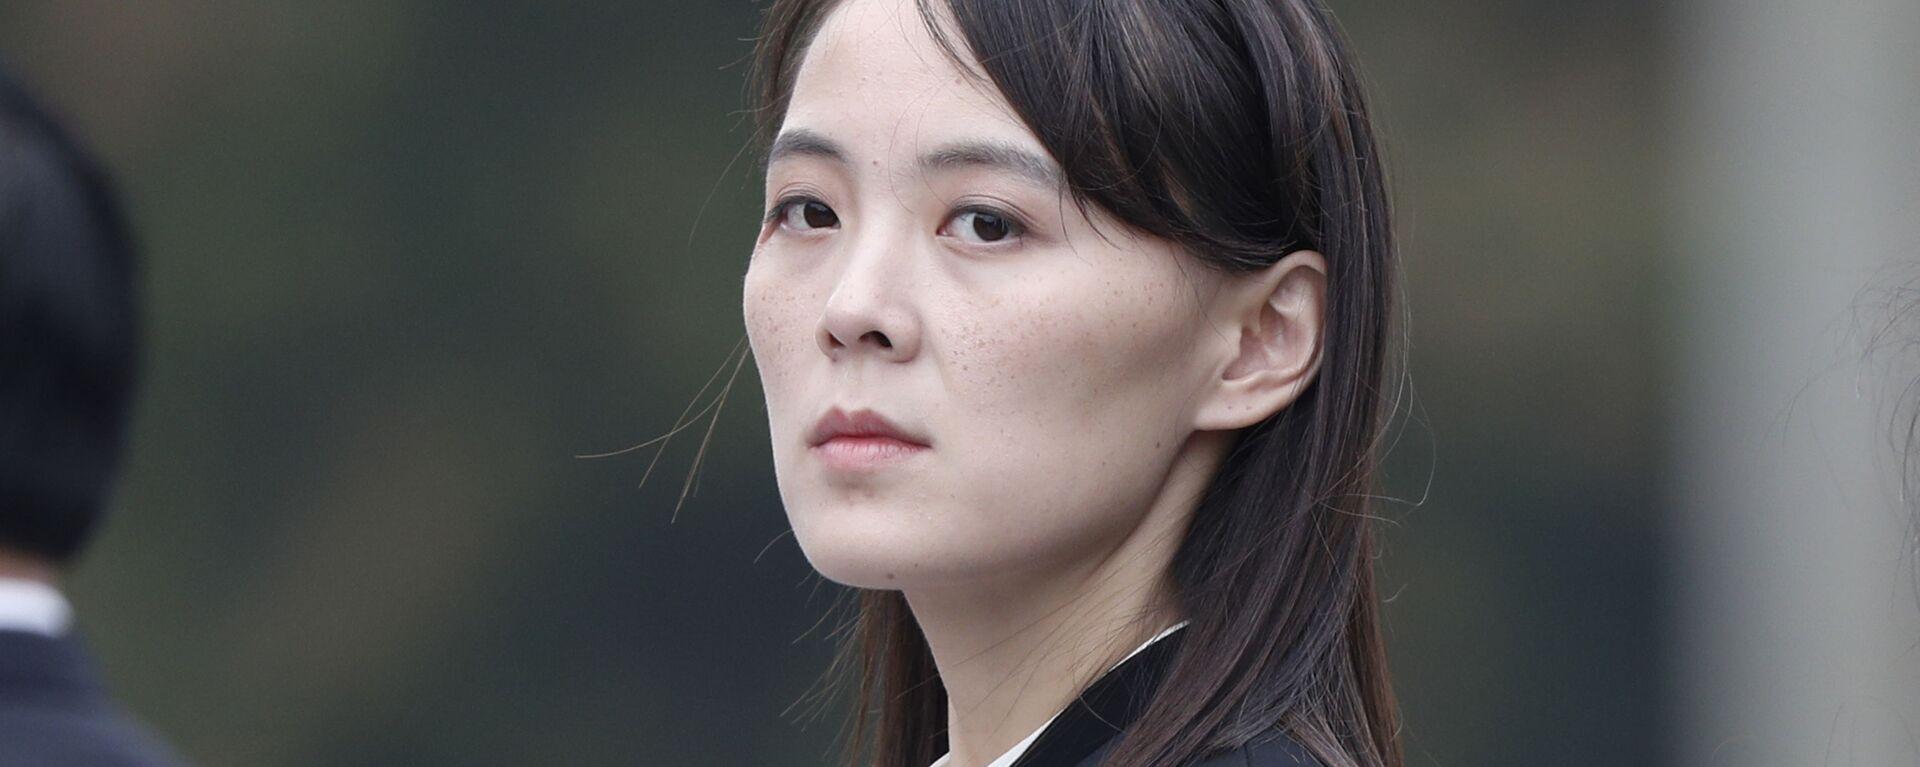 Kim Yo-jong, hermana de Kim Jong-un - Sputnik Mundo, 1920, 16.03.2021